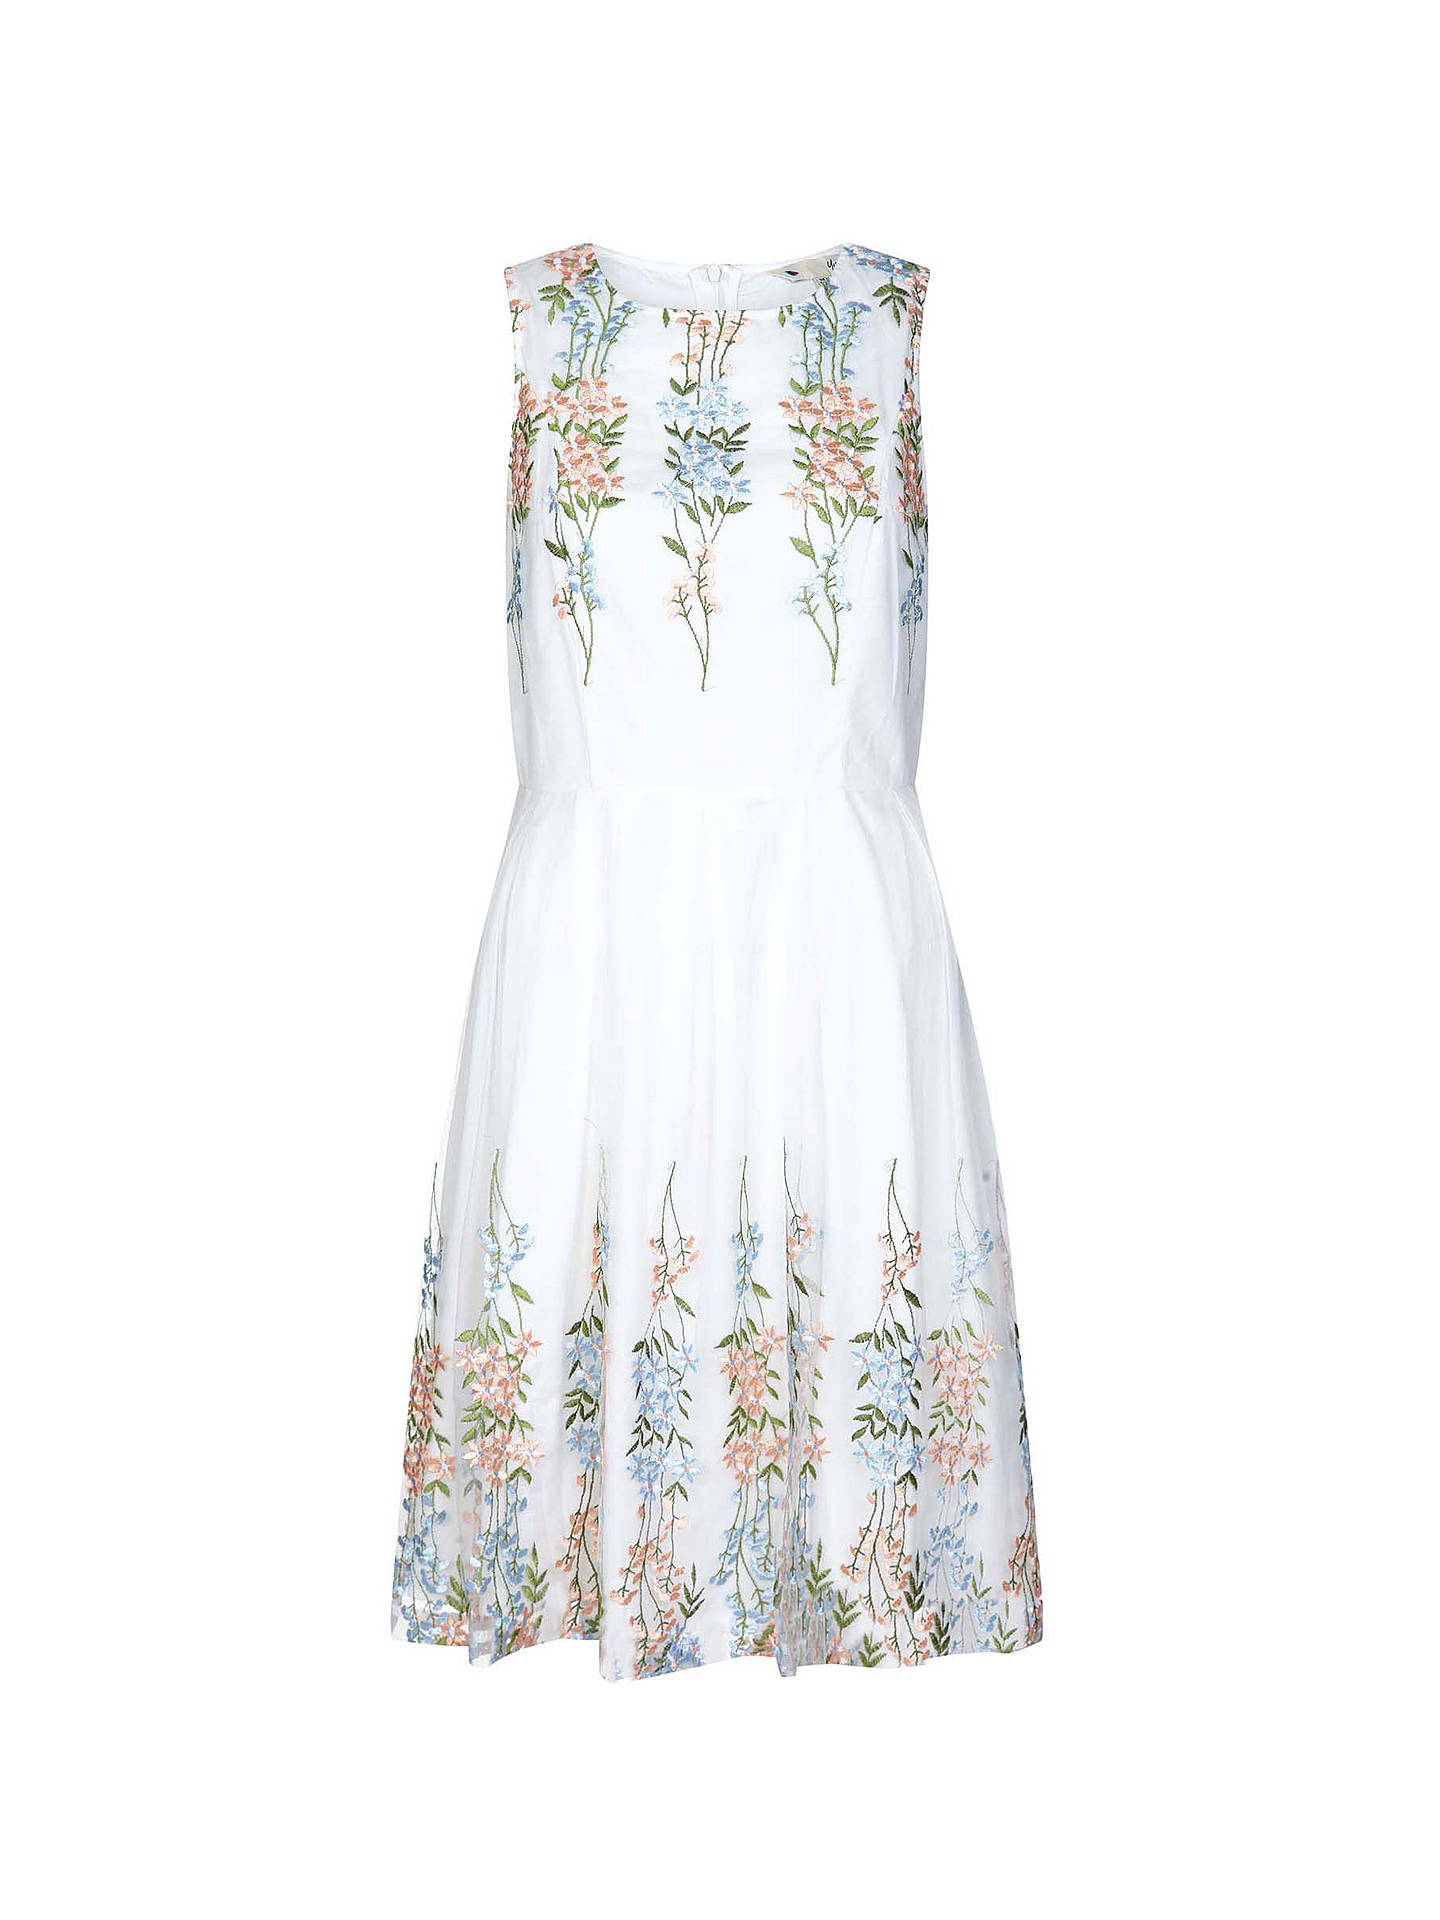 Yumi Skater Partners At John Lewisamp; Floral Dress Embroidered 7bfgyY6